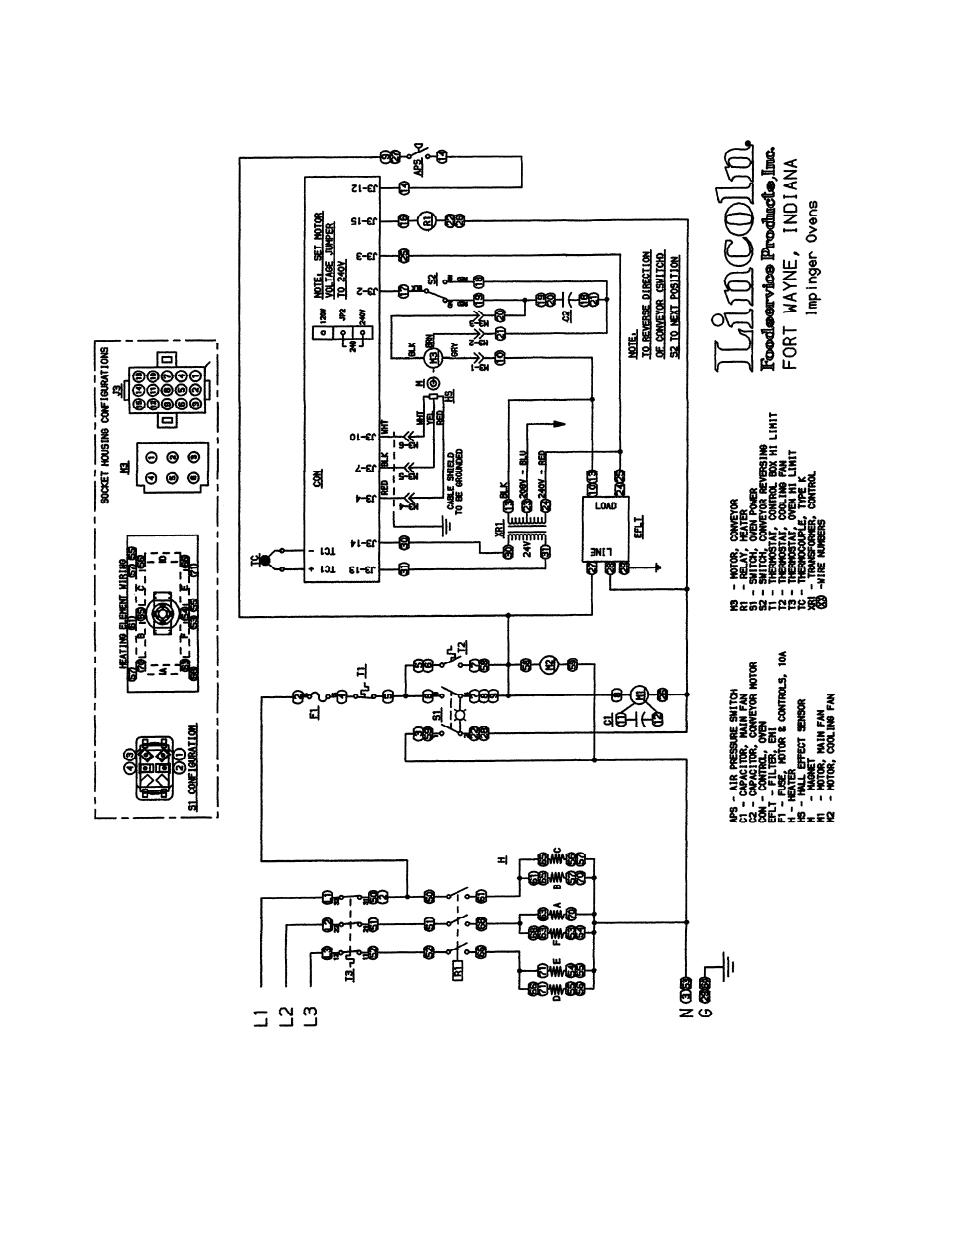 lincoln impinger wiring diagram wiring diagram electrical lincoln impinger pizza oven wiring diagram lincoln impinger wiring diagram #5